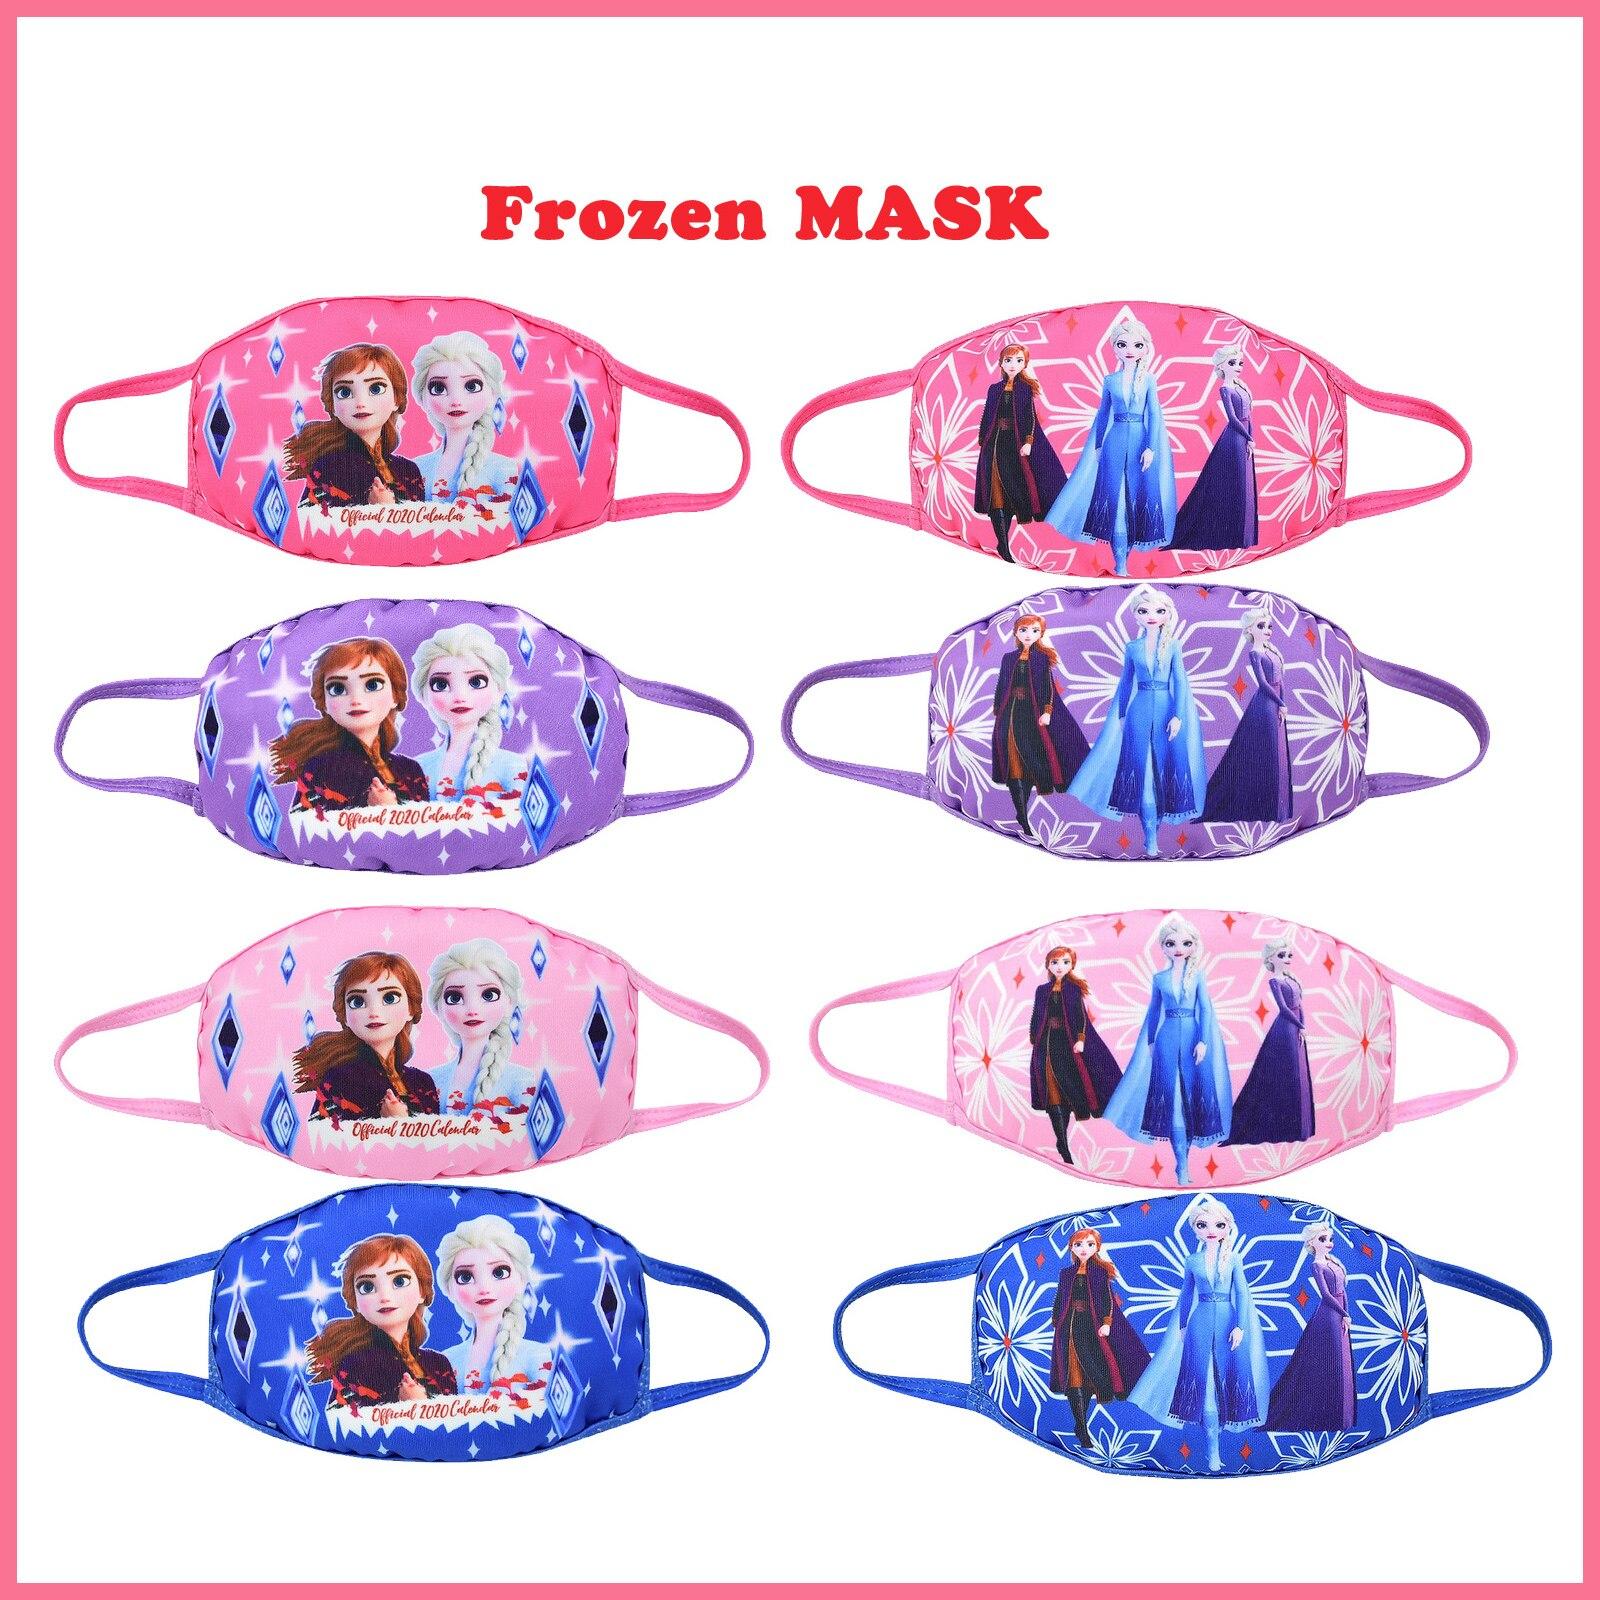 Original 2020 Frozen 2 Kids Cotton Masks Disney Princess Anna Elsa Anime Figures Face Mouth Protection Masks Gifts For Girls